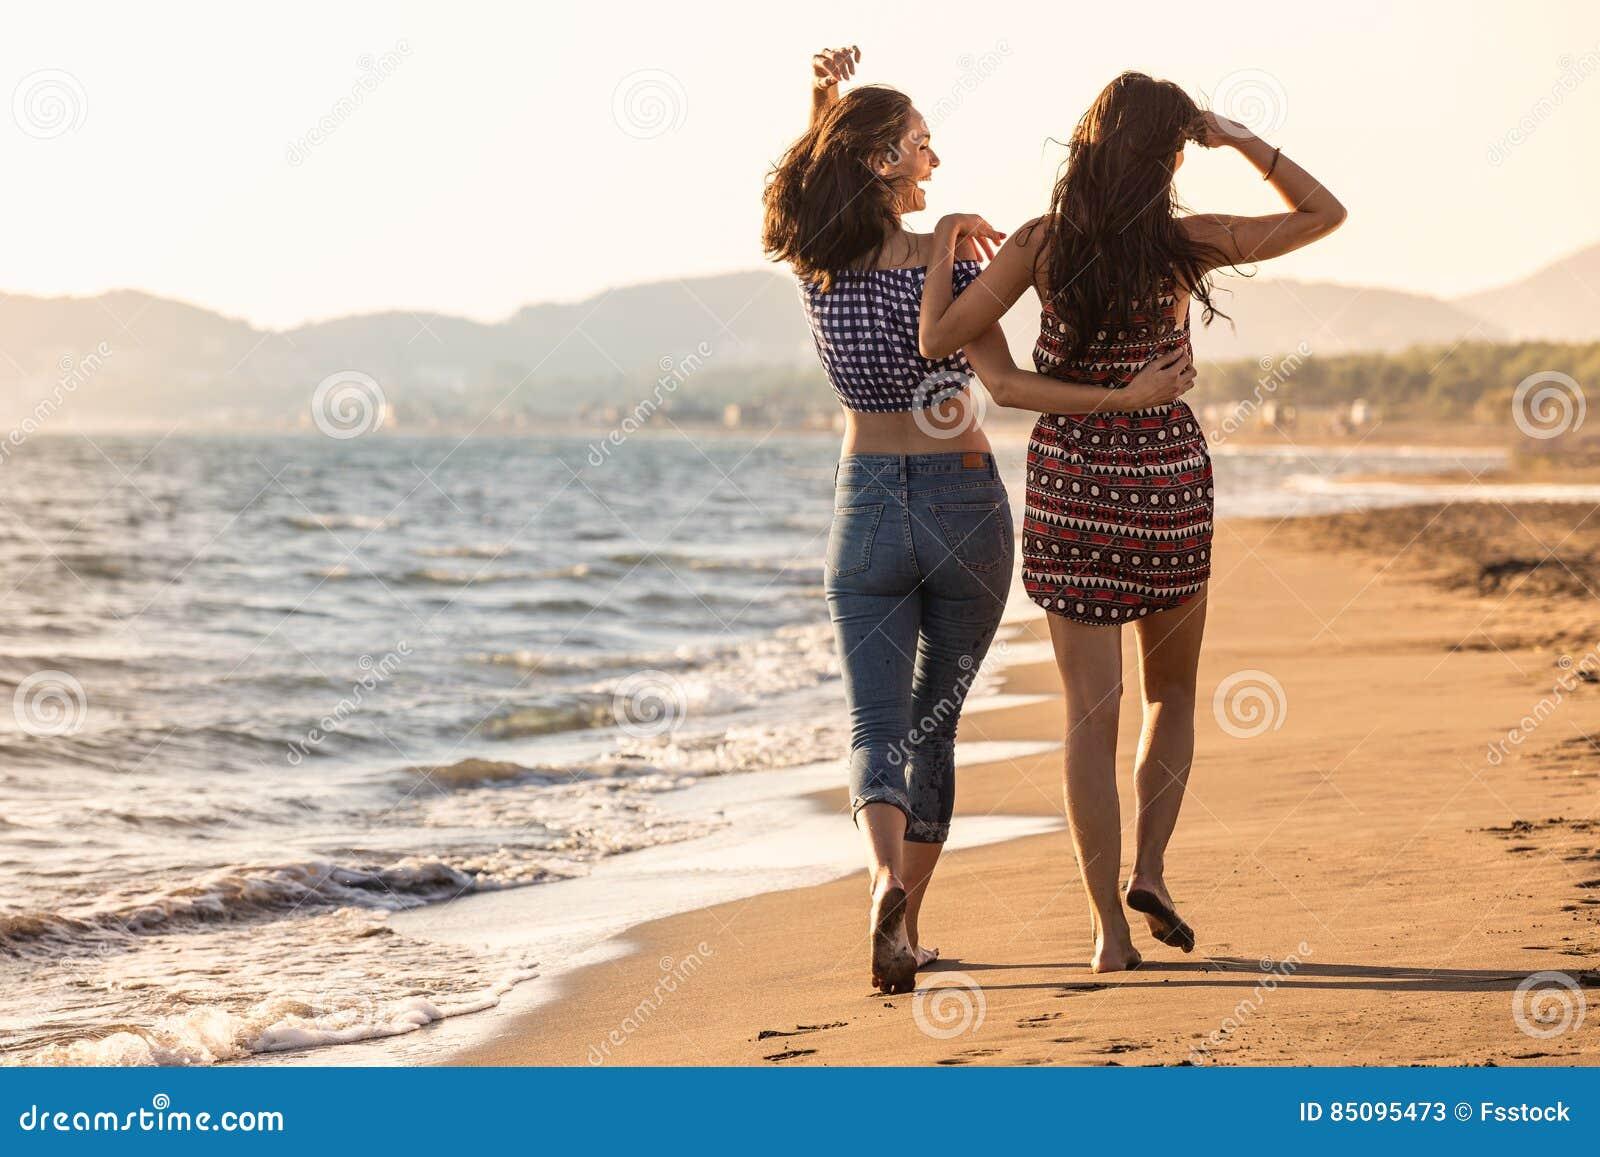 La muchacha bonita se divierte con su novia en la playa